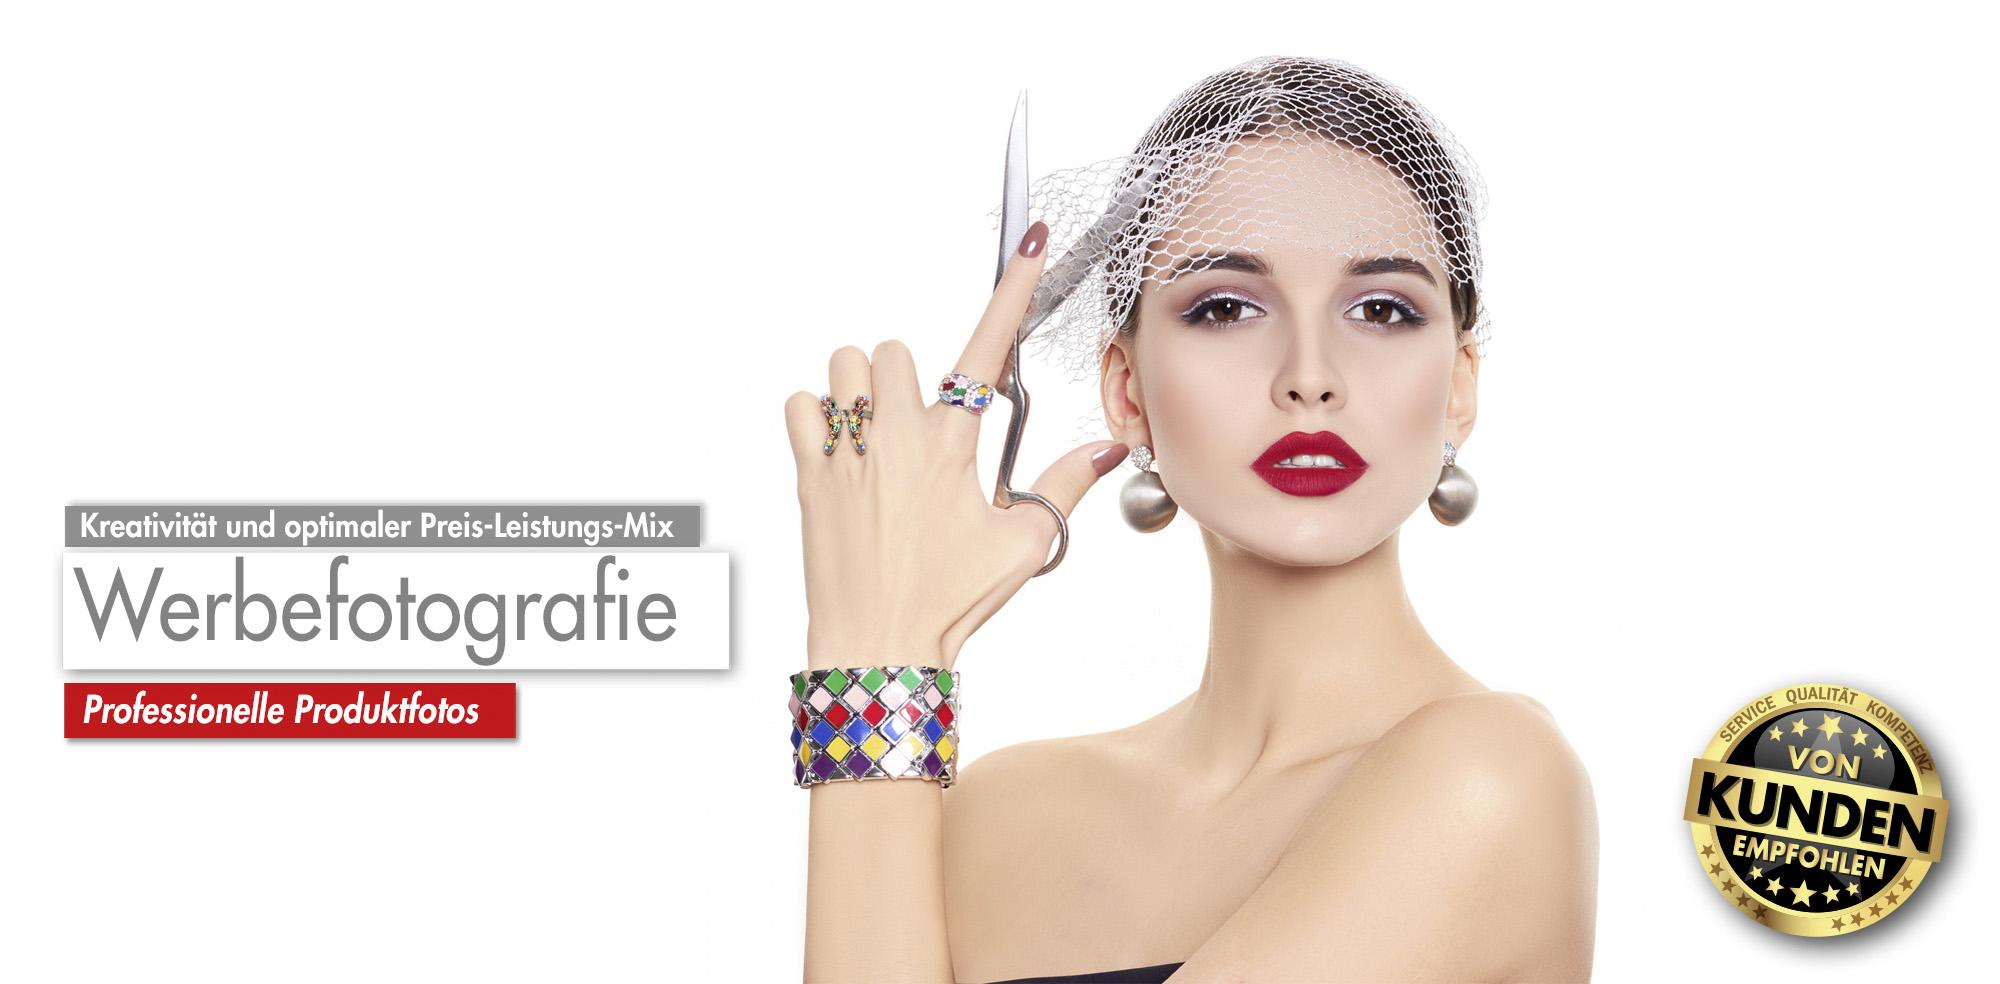 Produktfotografie, Modefotografie und Werbefotografie @ BlickFang2 Fotostudio, Filmstudio in Weinheim und Andernach, Fotograf